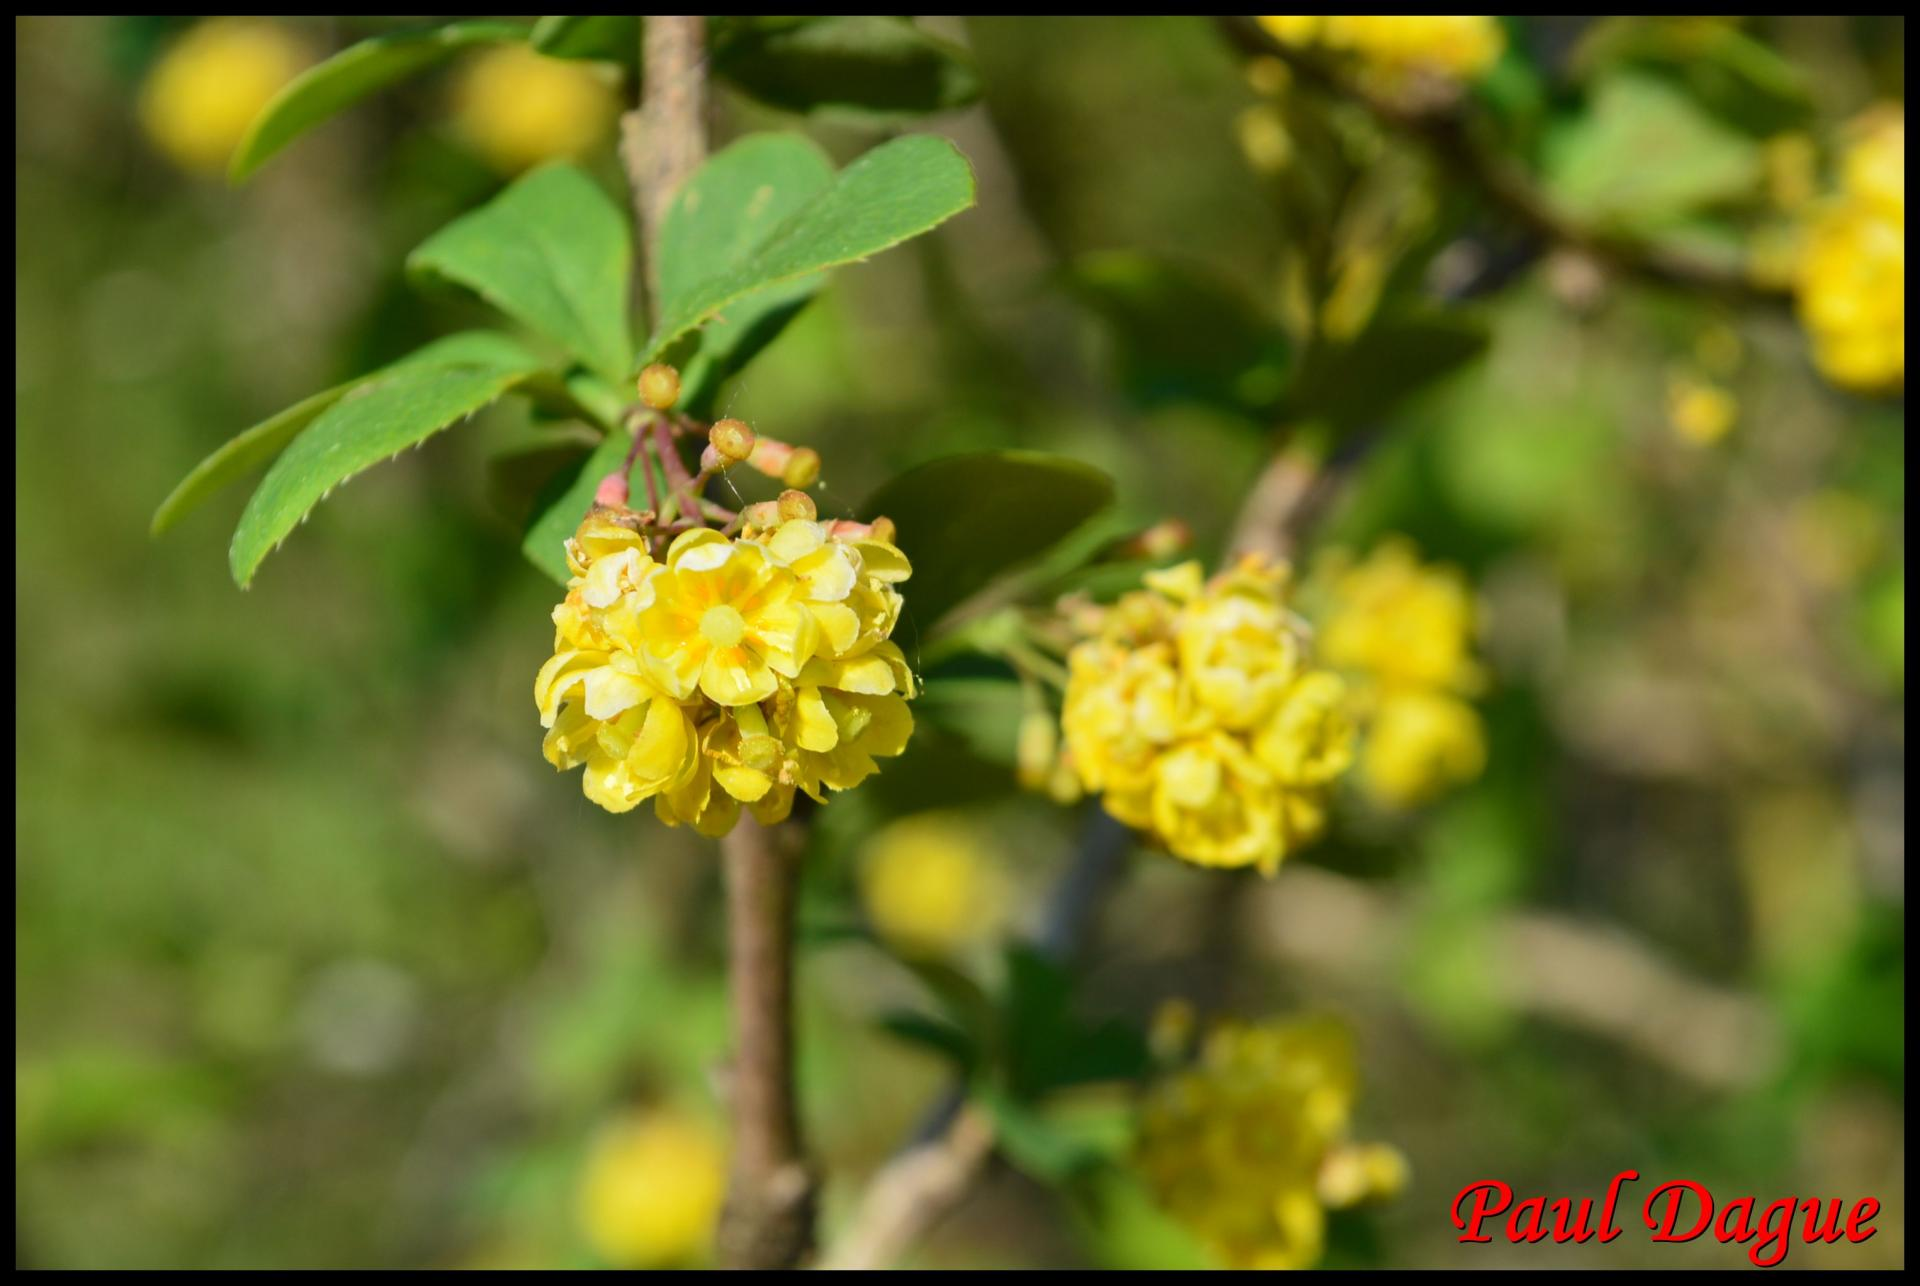 349 epine vinette berberis vulgaris berberidaceae 2 resultat